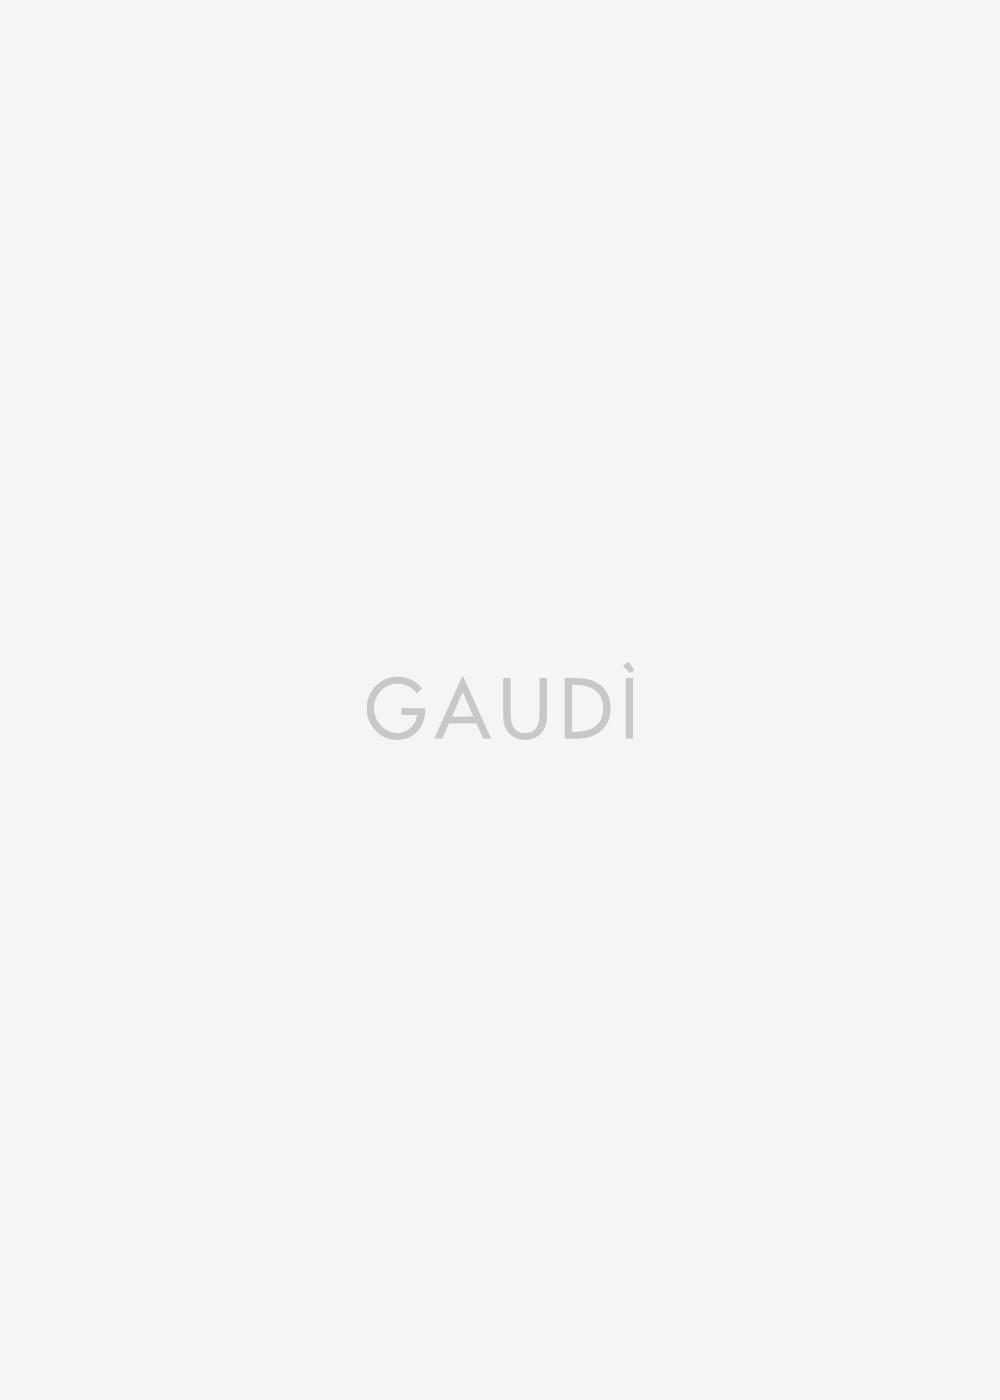 design di qualità 05d86 ed954 Abbigliamento donna online casual ed elegante A/I 2019 | Gaudì